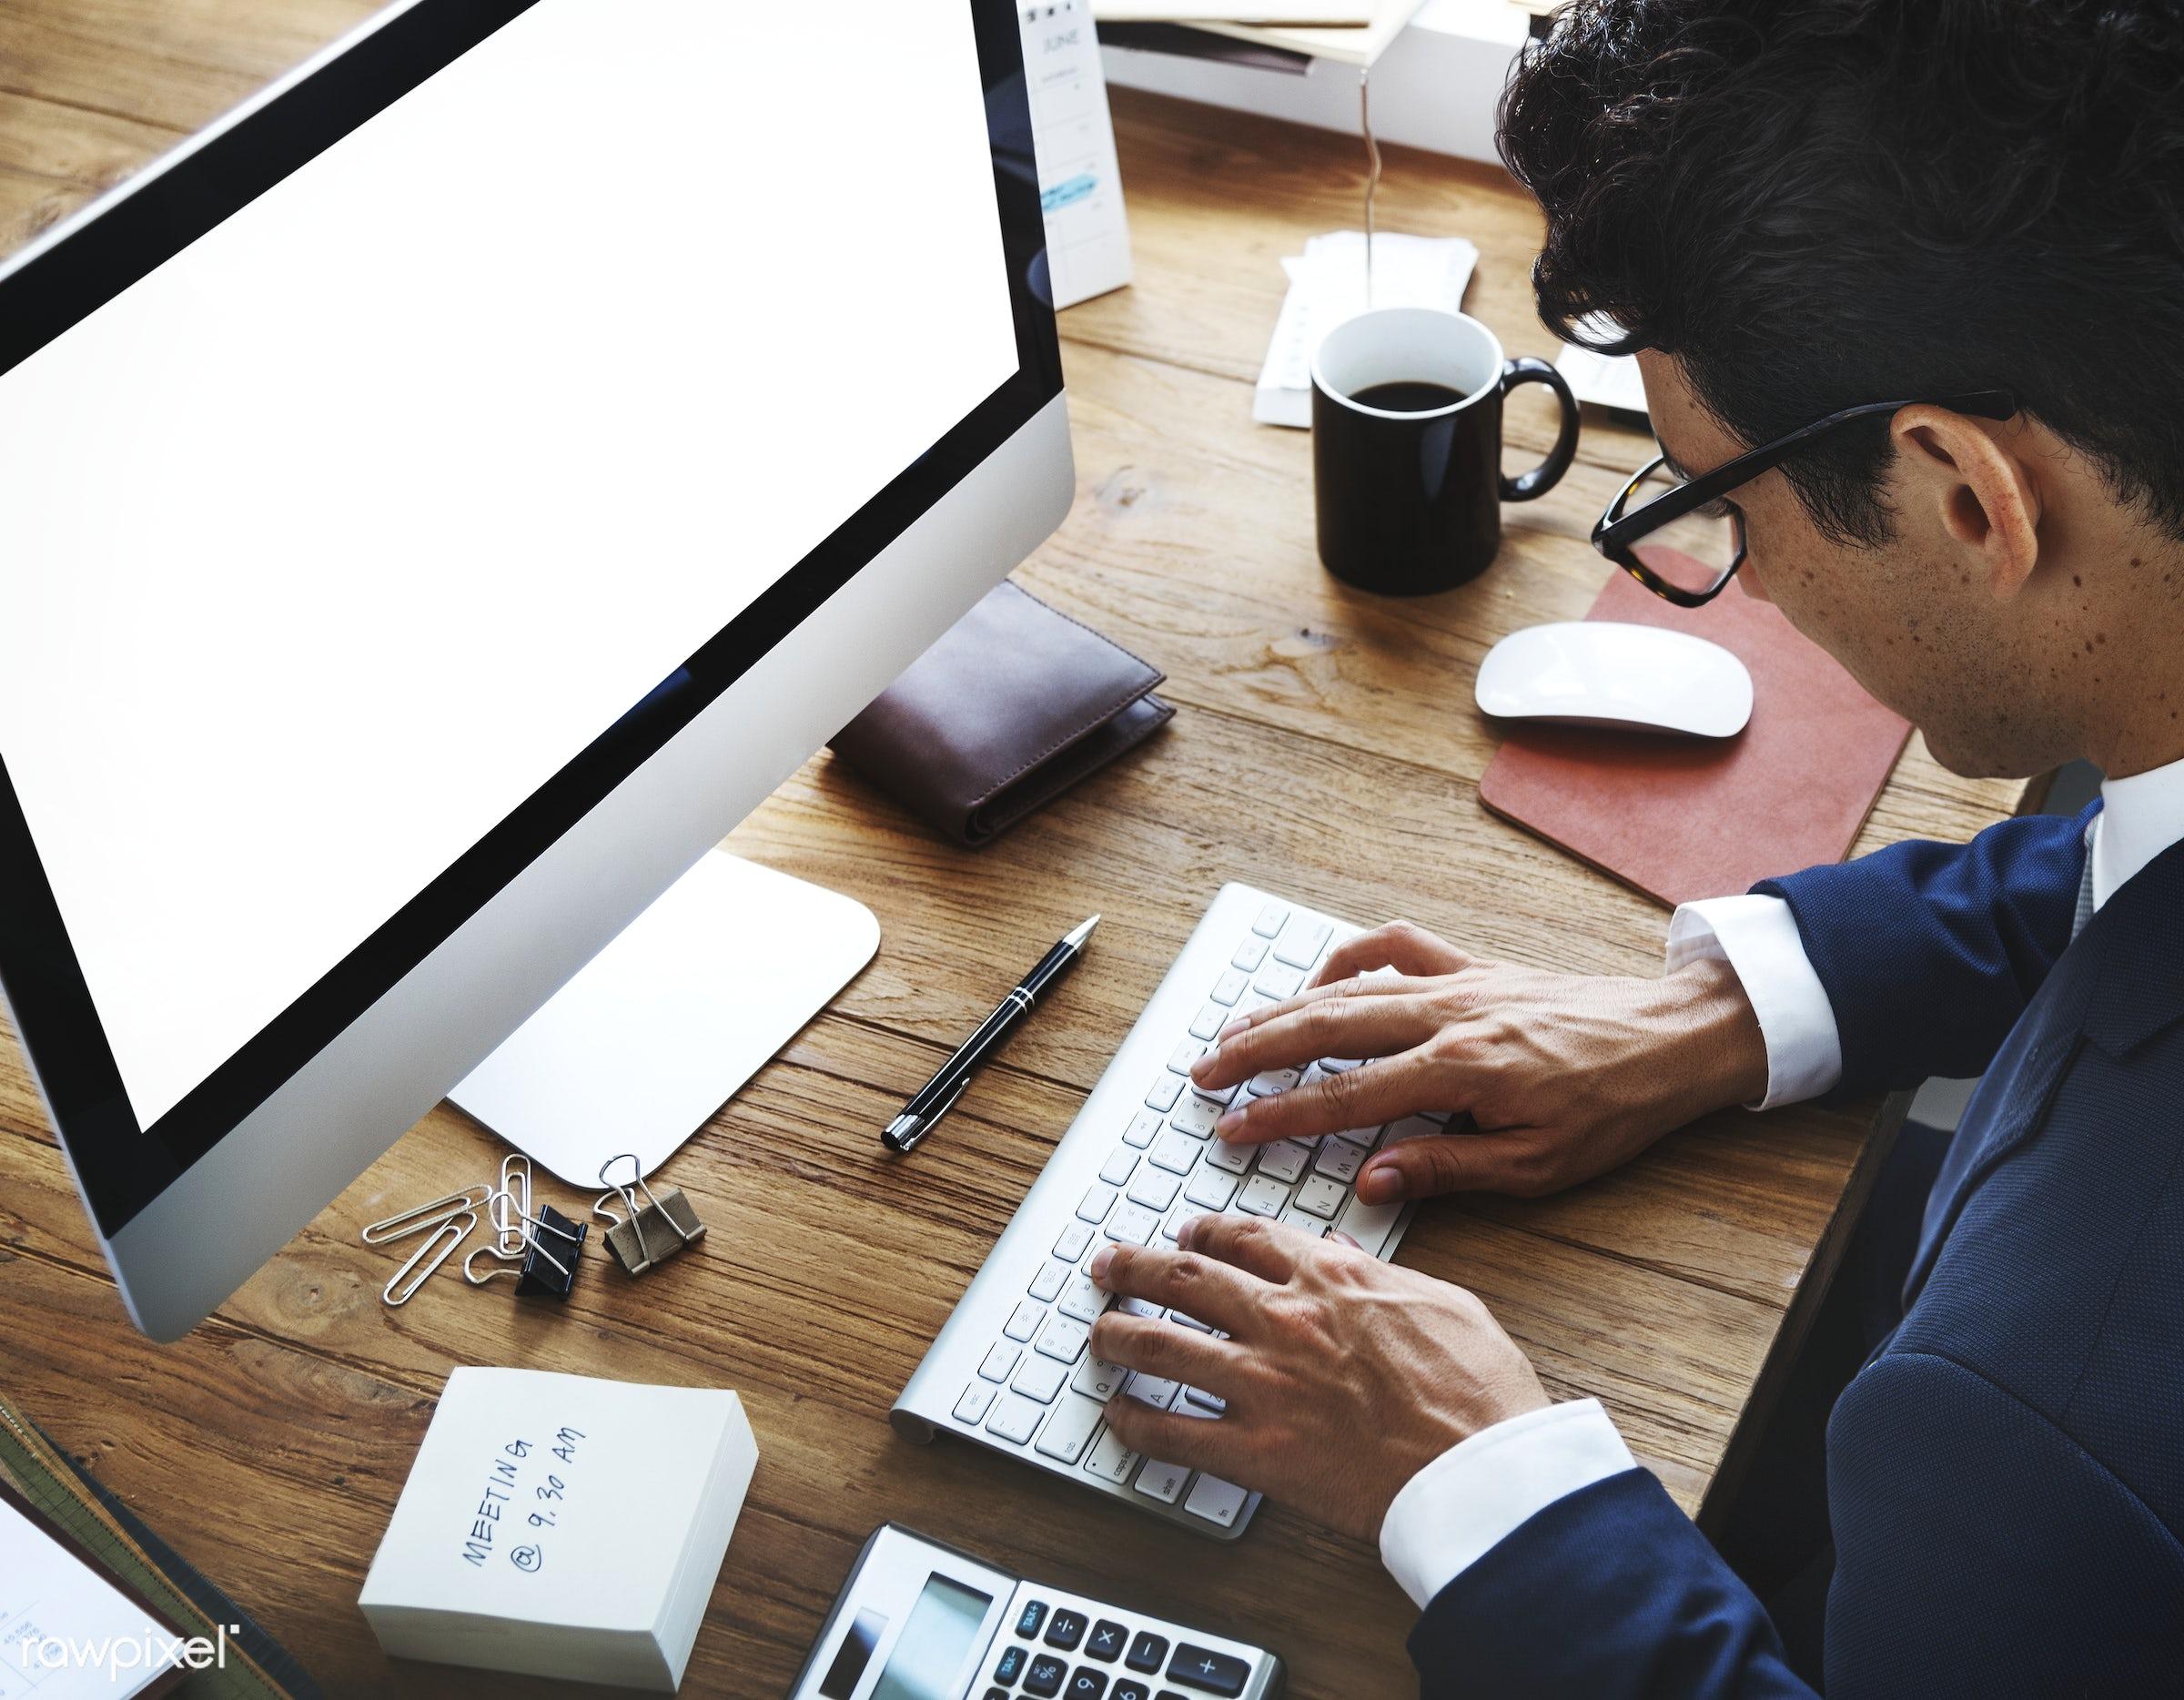 accounting, analysis, analytics, blank, business, businessman, busy, calculator, calendar, coffee, communication, computer,...